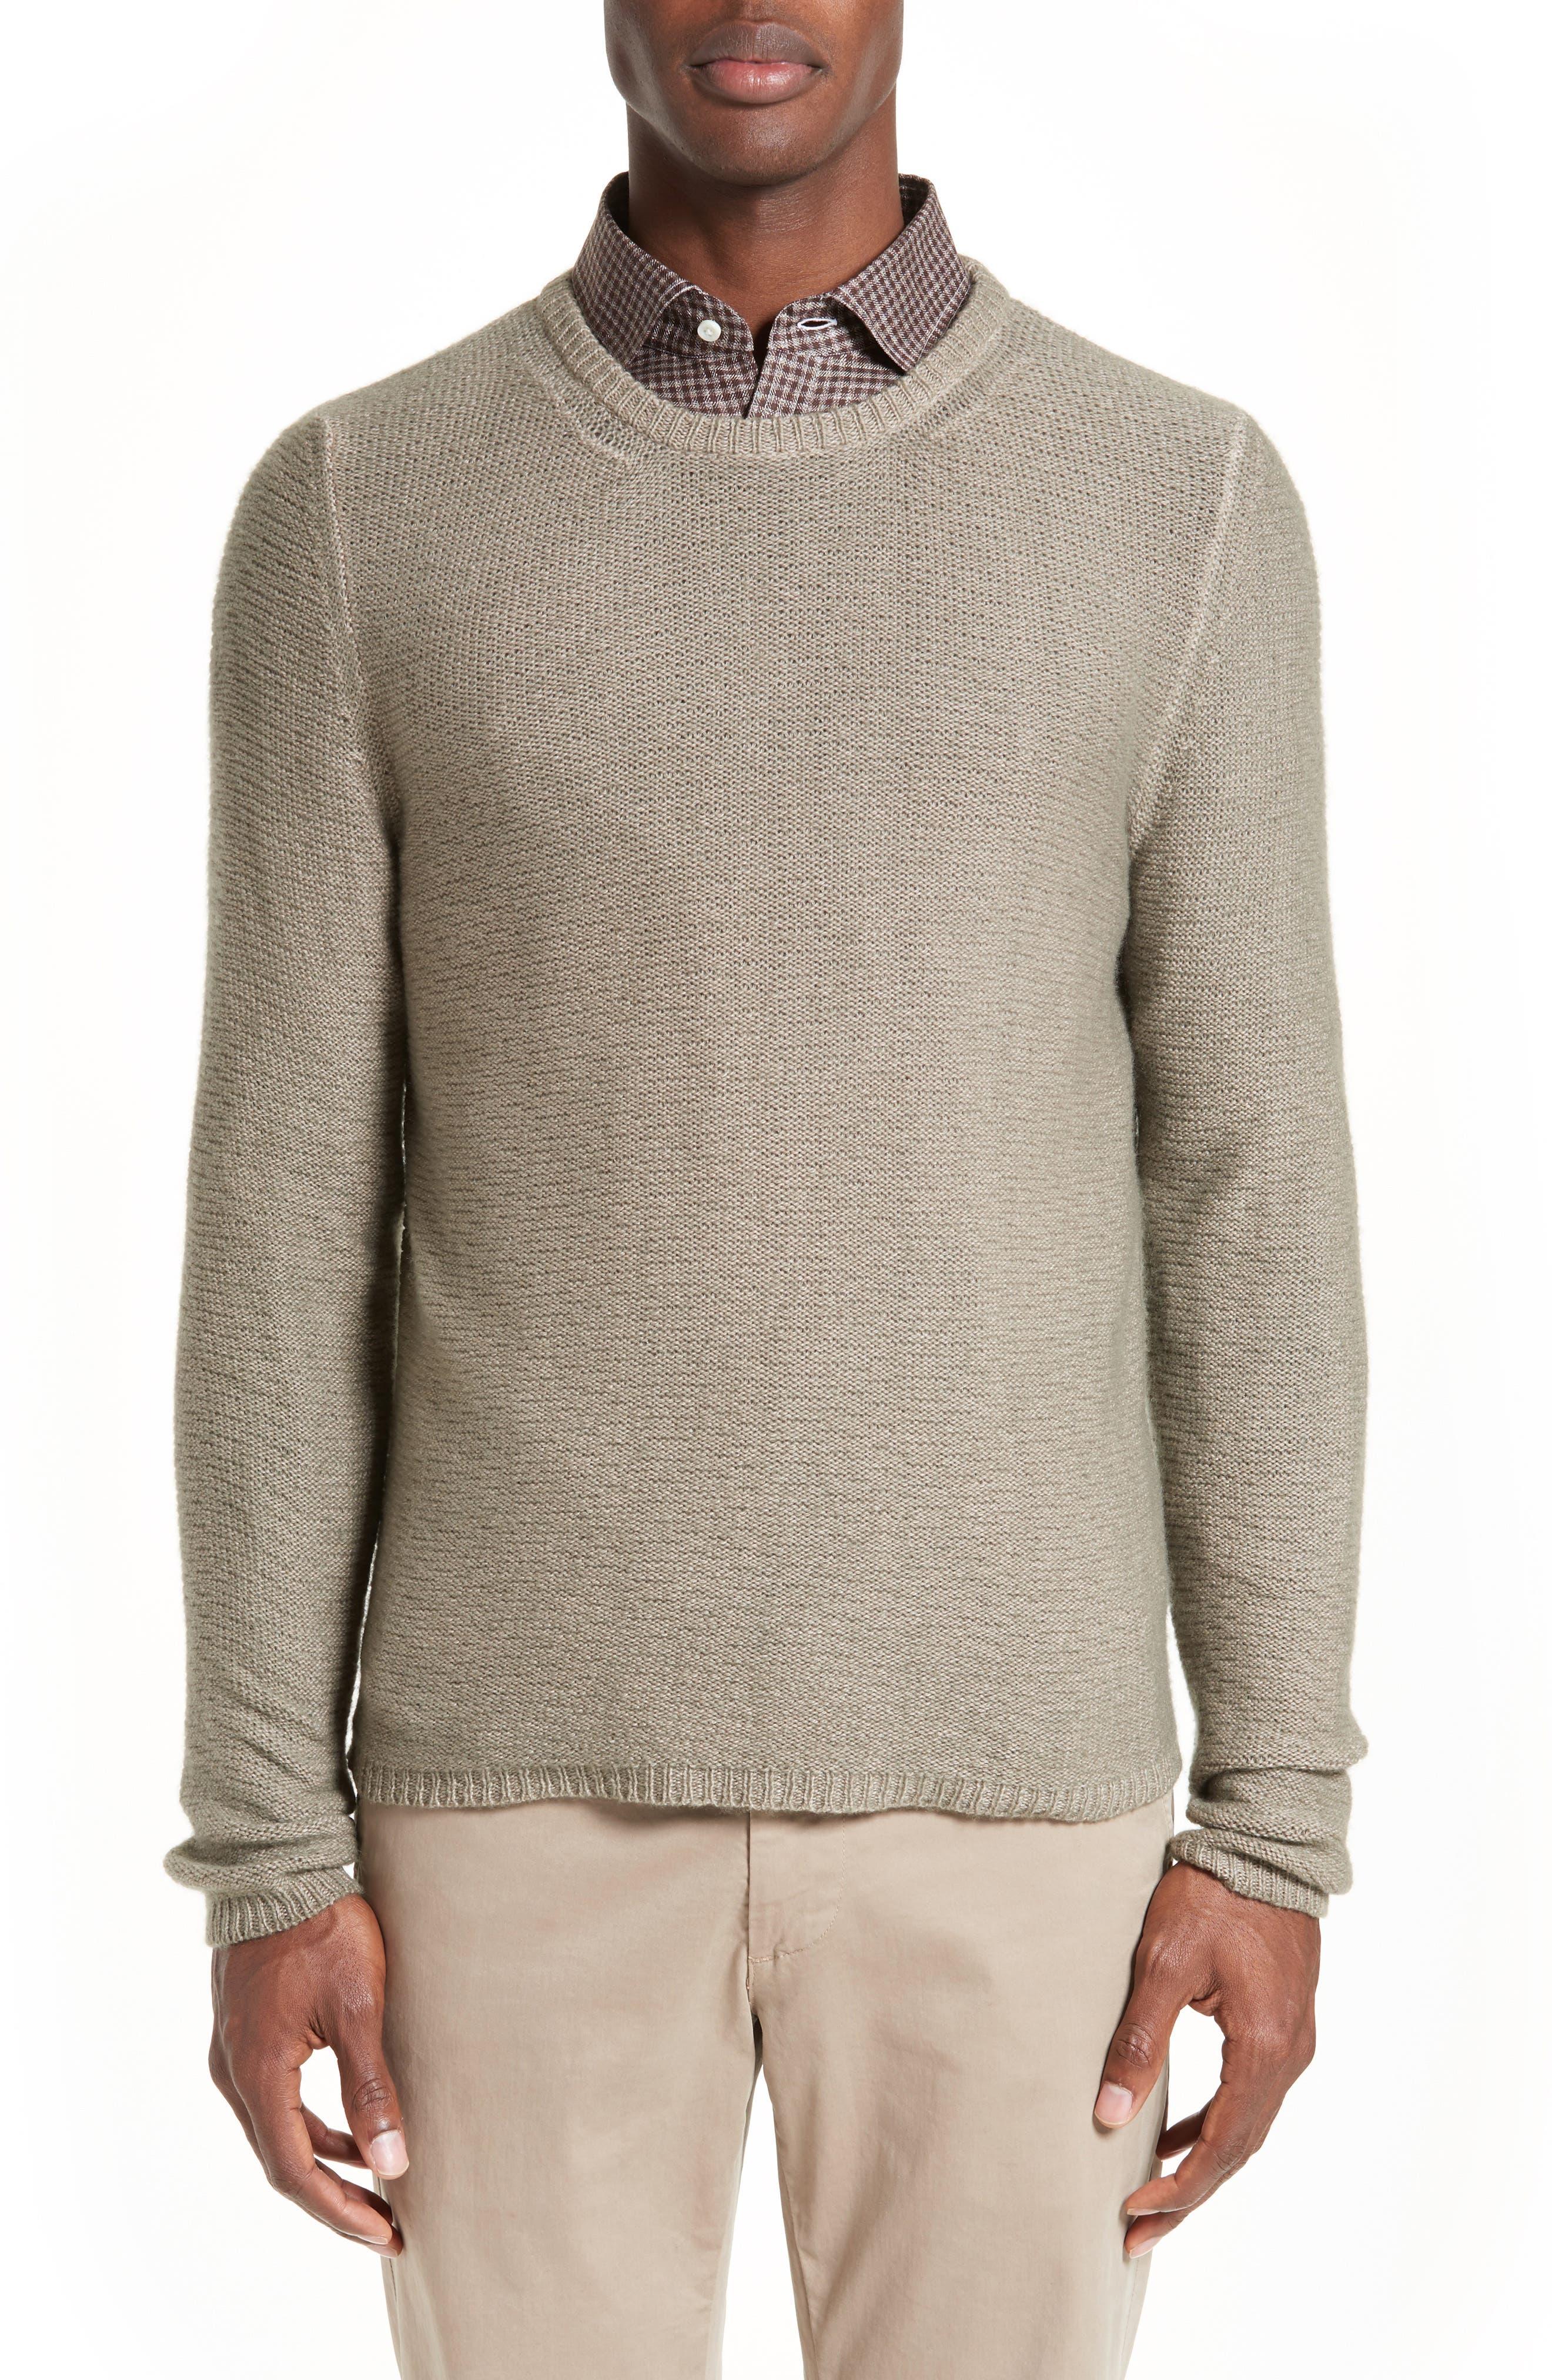 Napoli Slub Cashmere Sweater,                             Main thumbnail 1, color,                             200